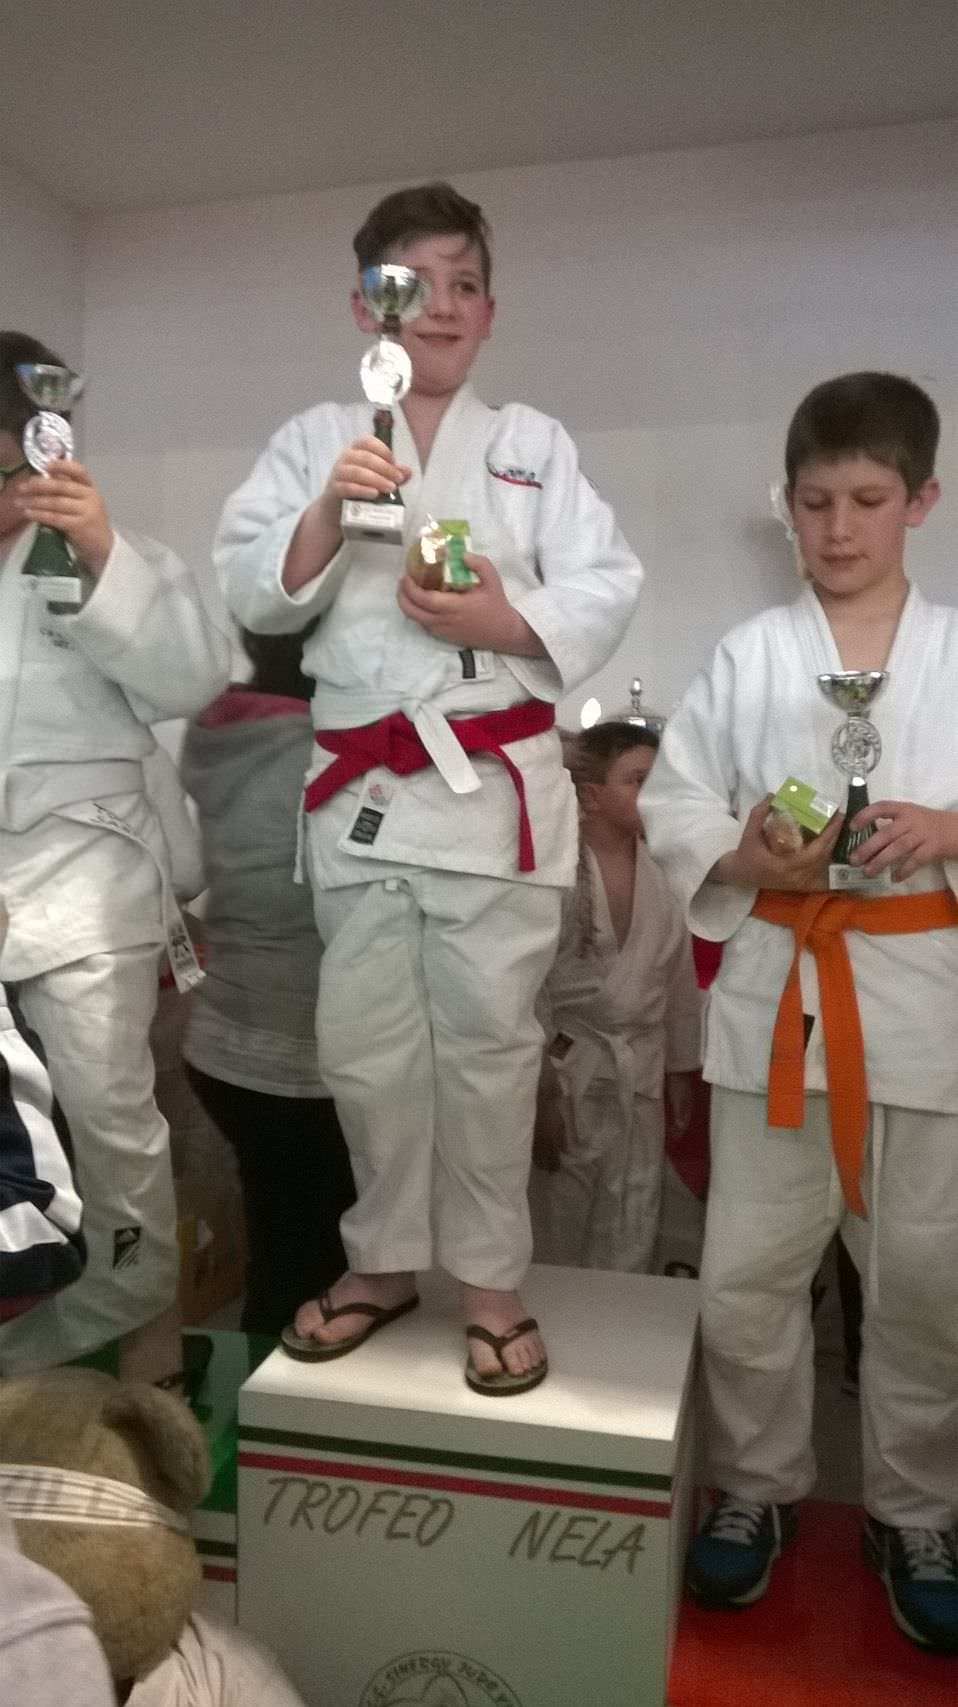 trofeo nela